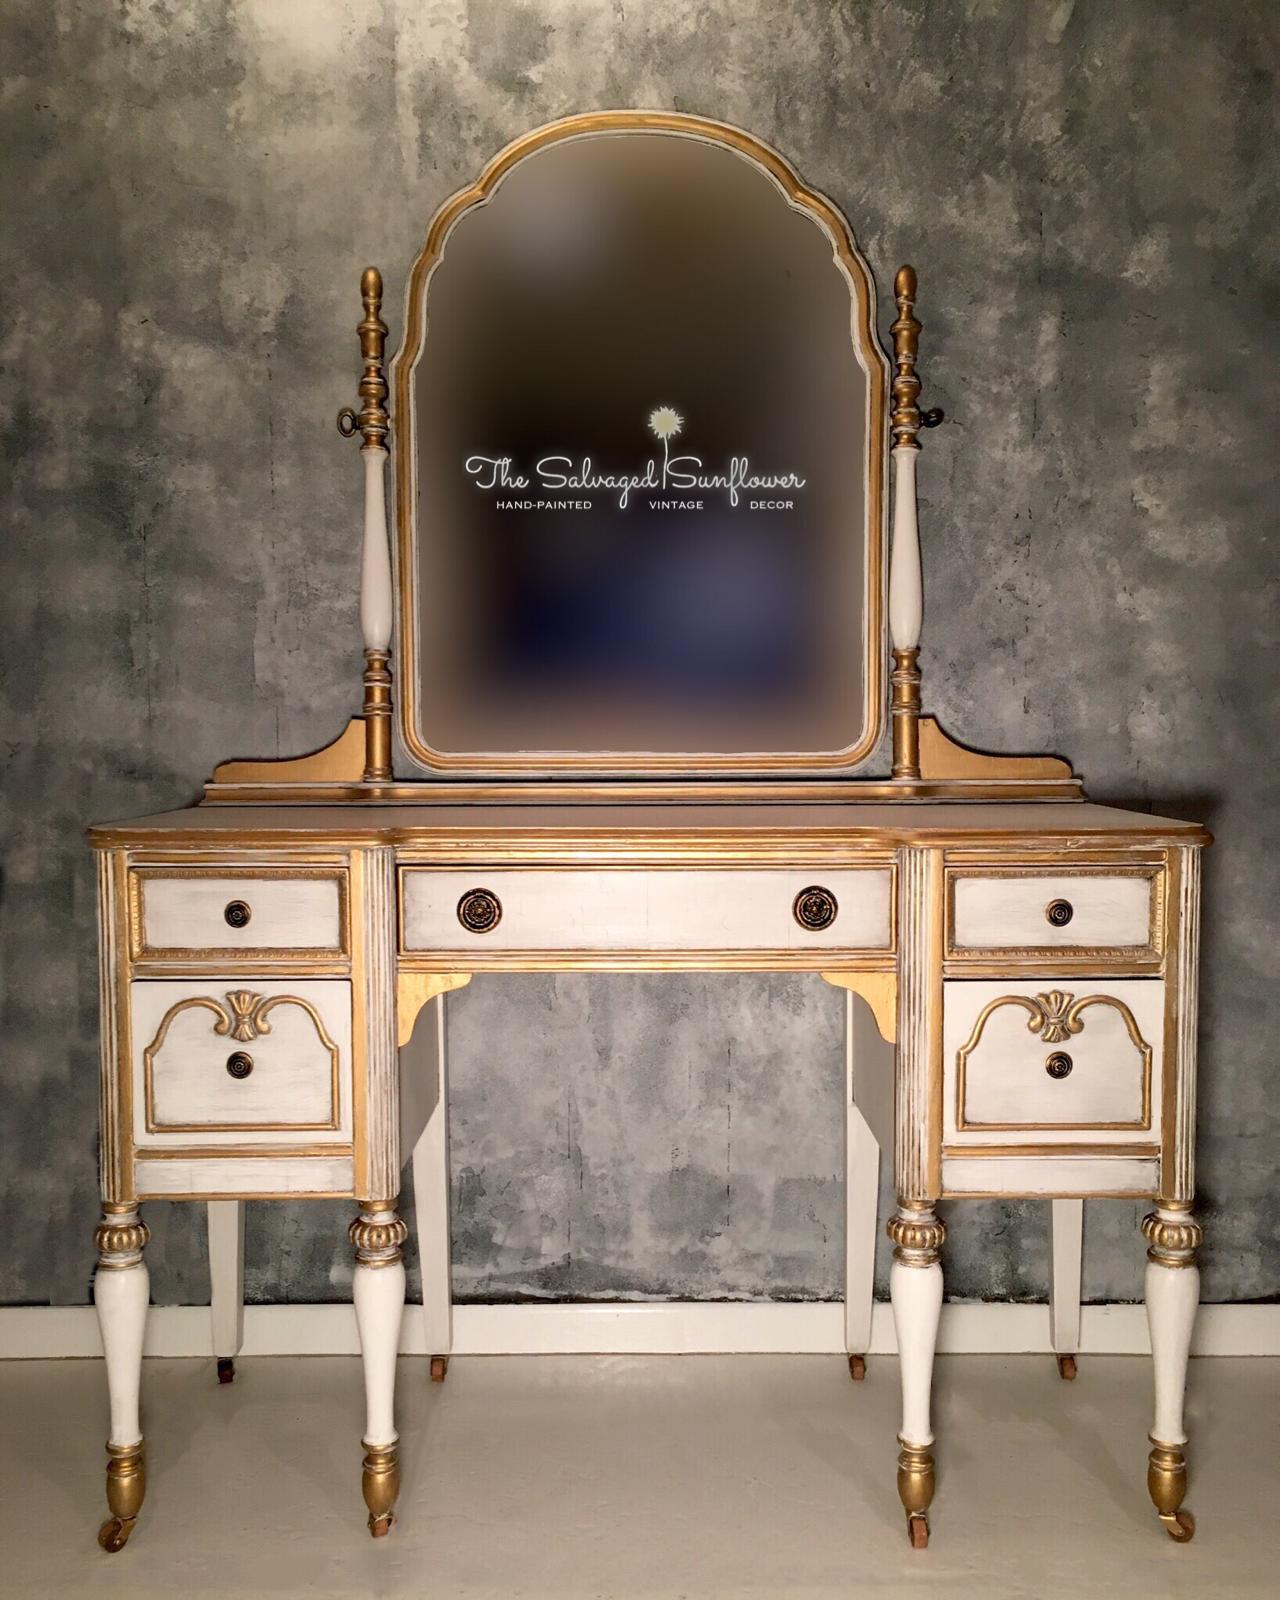 Vintage Old World Elegant Vanity Thesalvagedsunflower Elegant Vanity Vanity Mirror Vanity